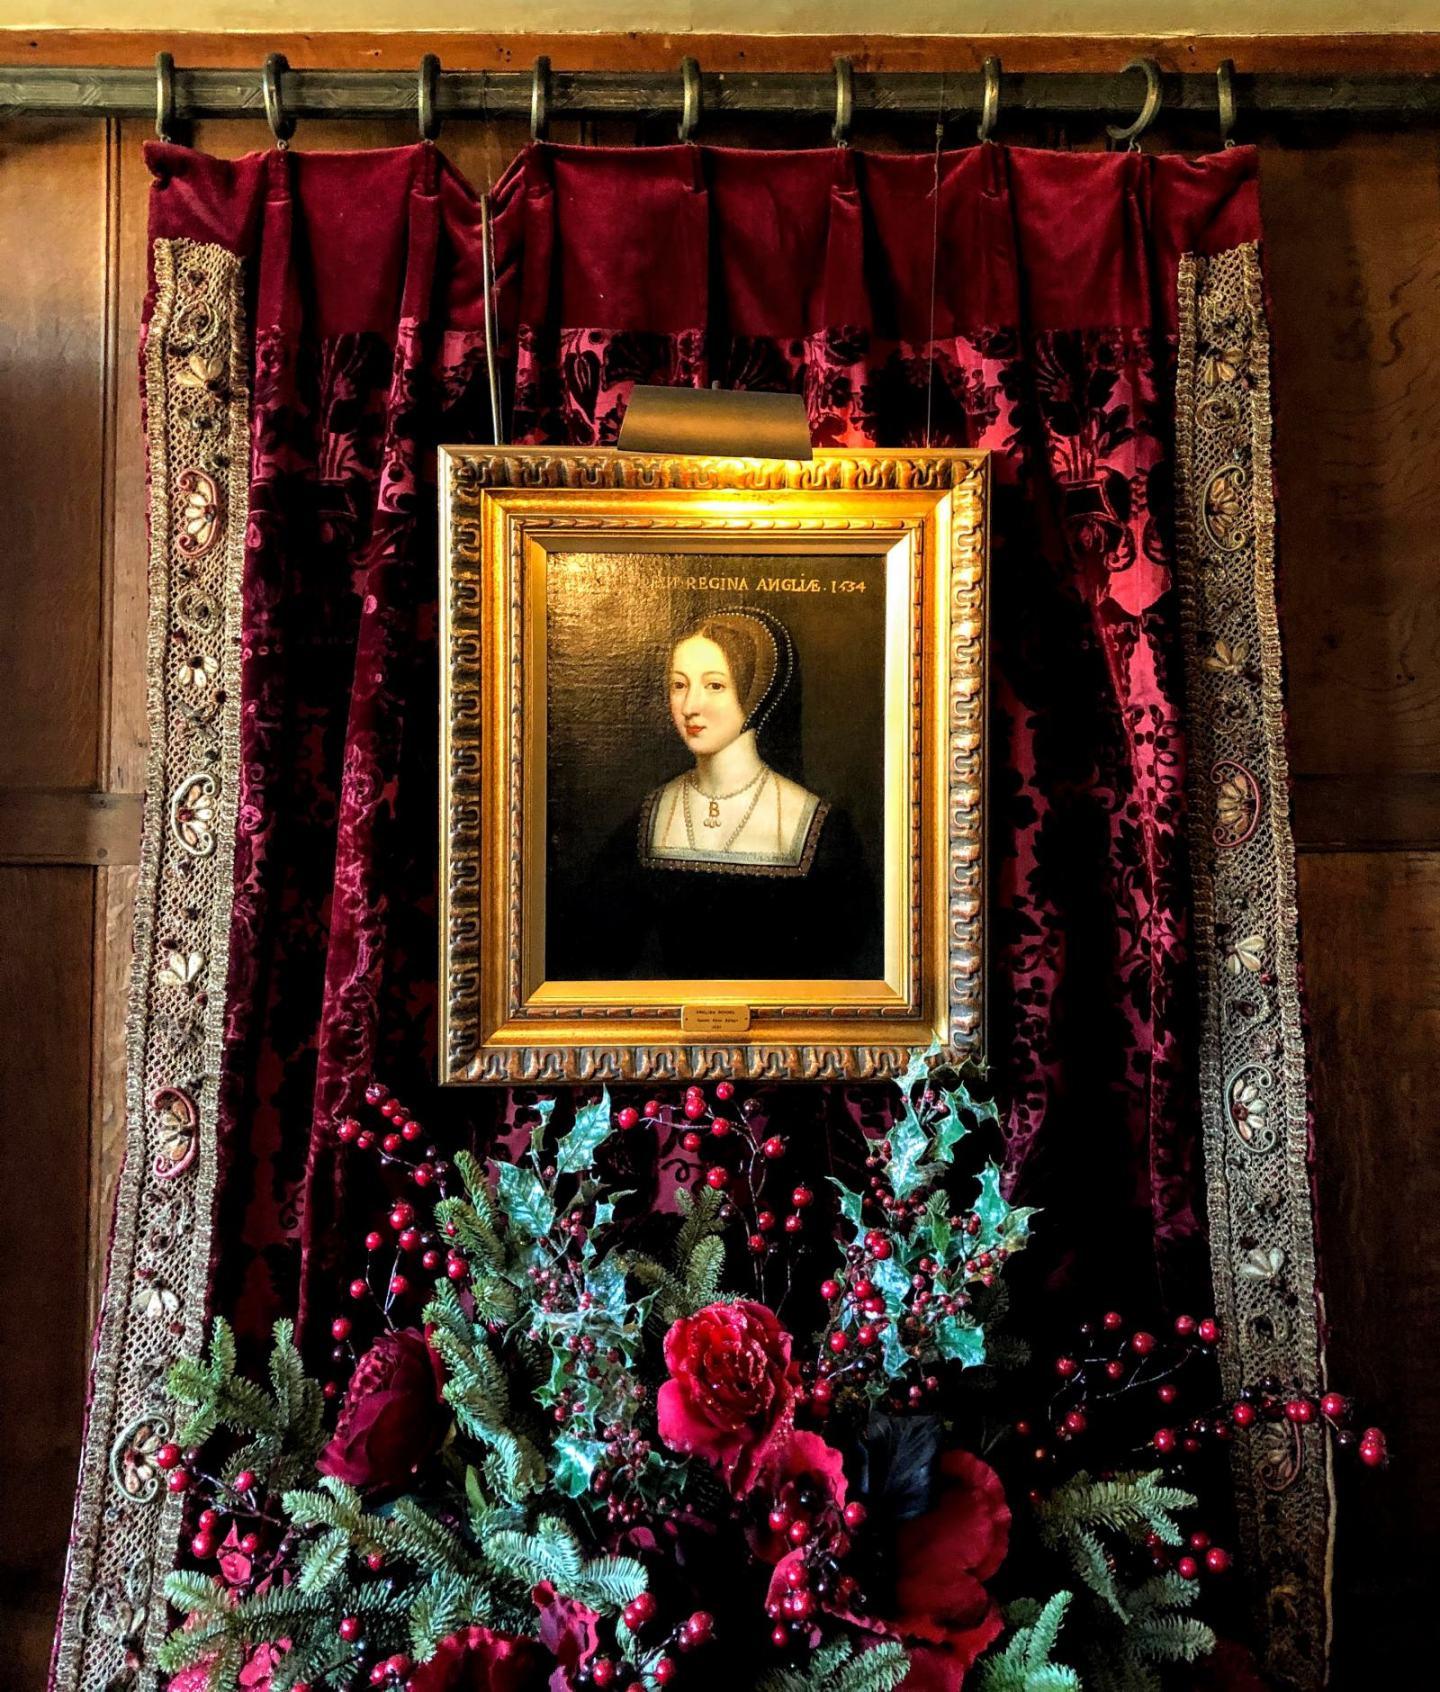 the portrait of Anne Boleyn hanging in her childhood home Hever castle